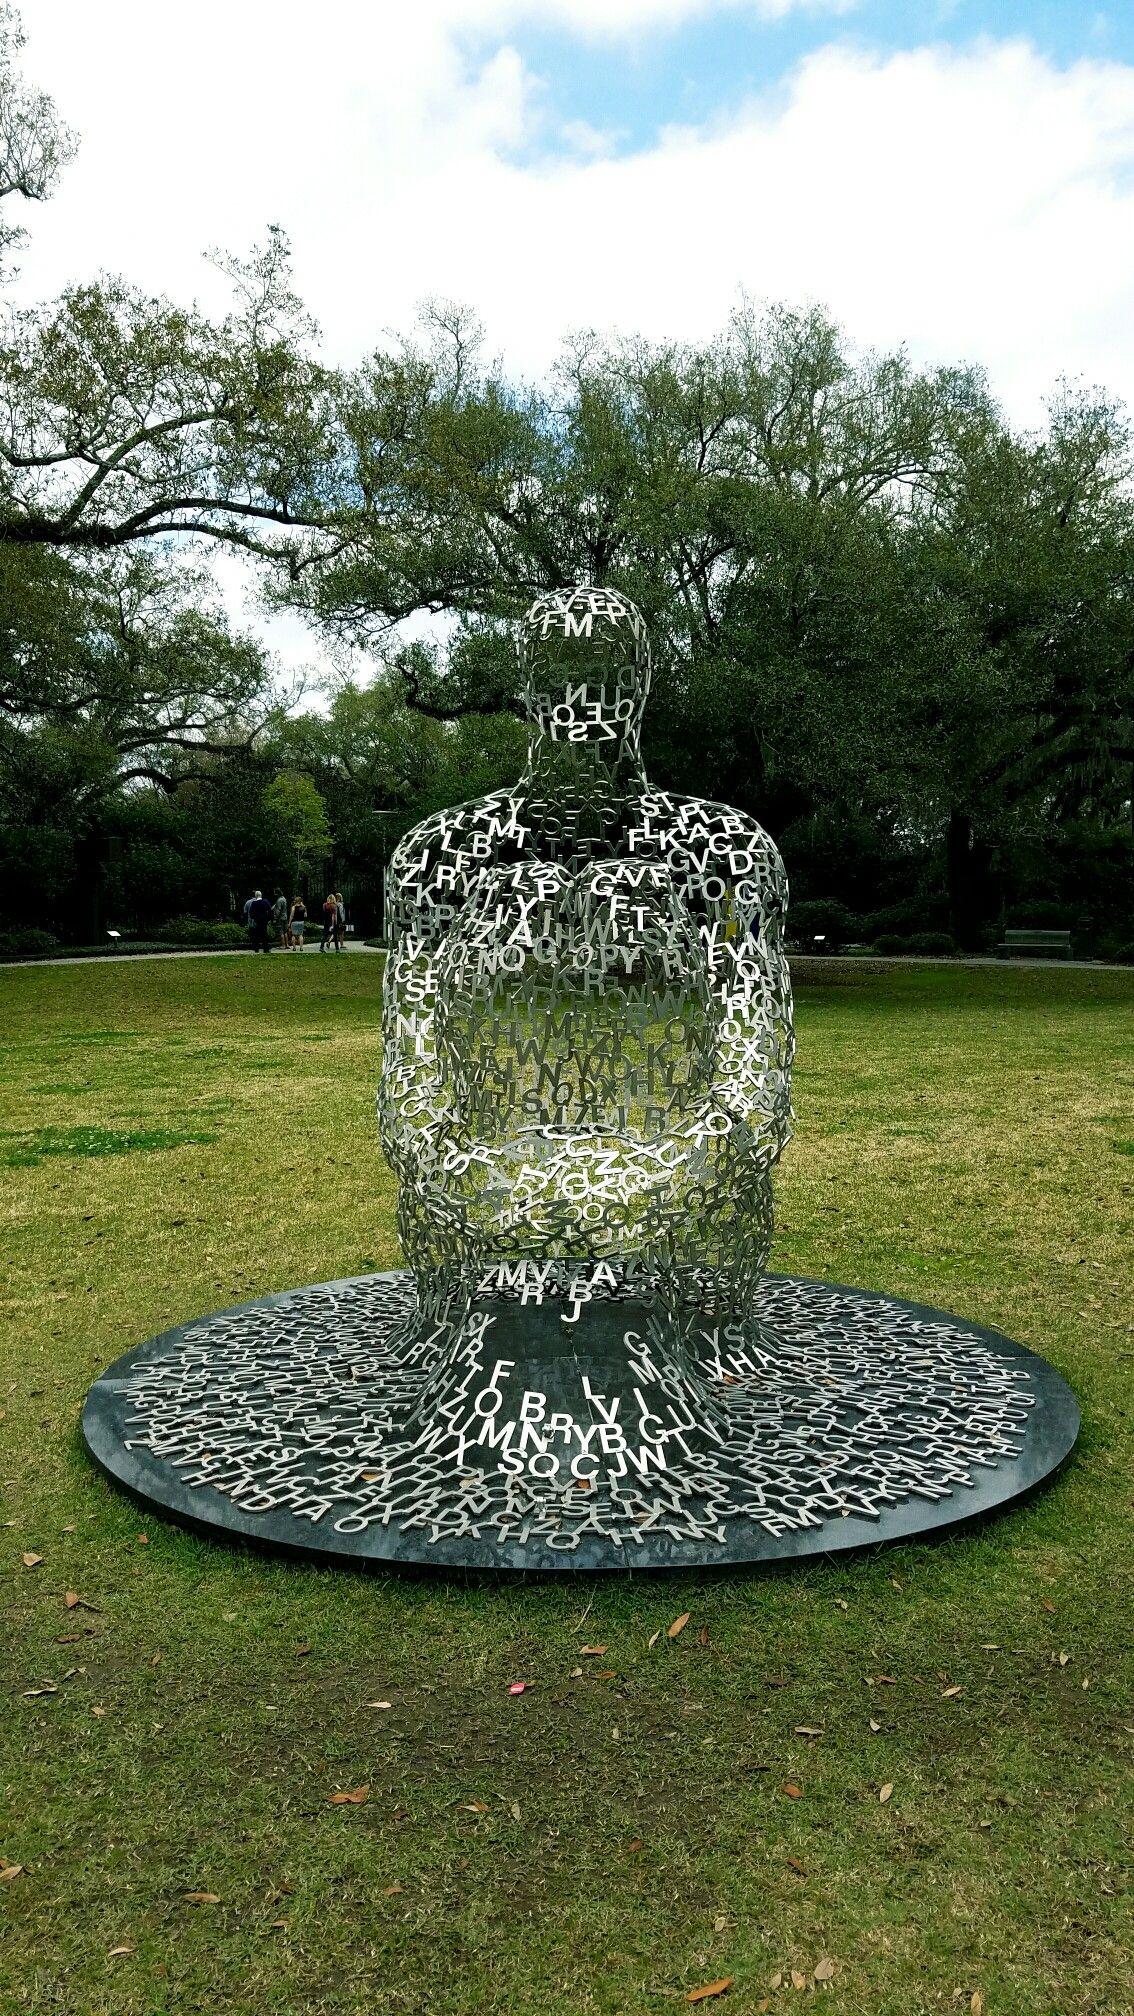 Sculpture Garden, New Orleans